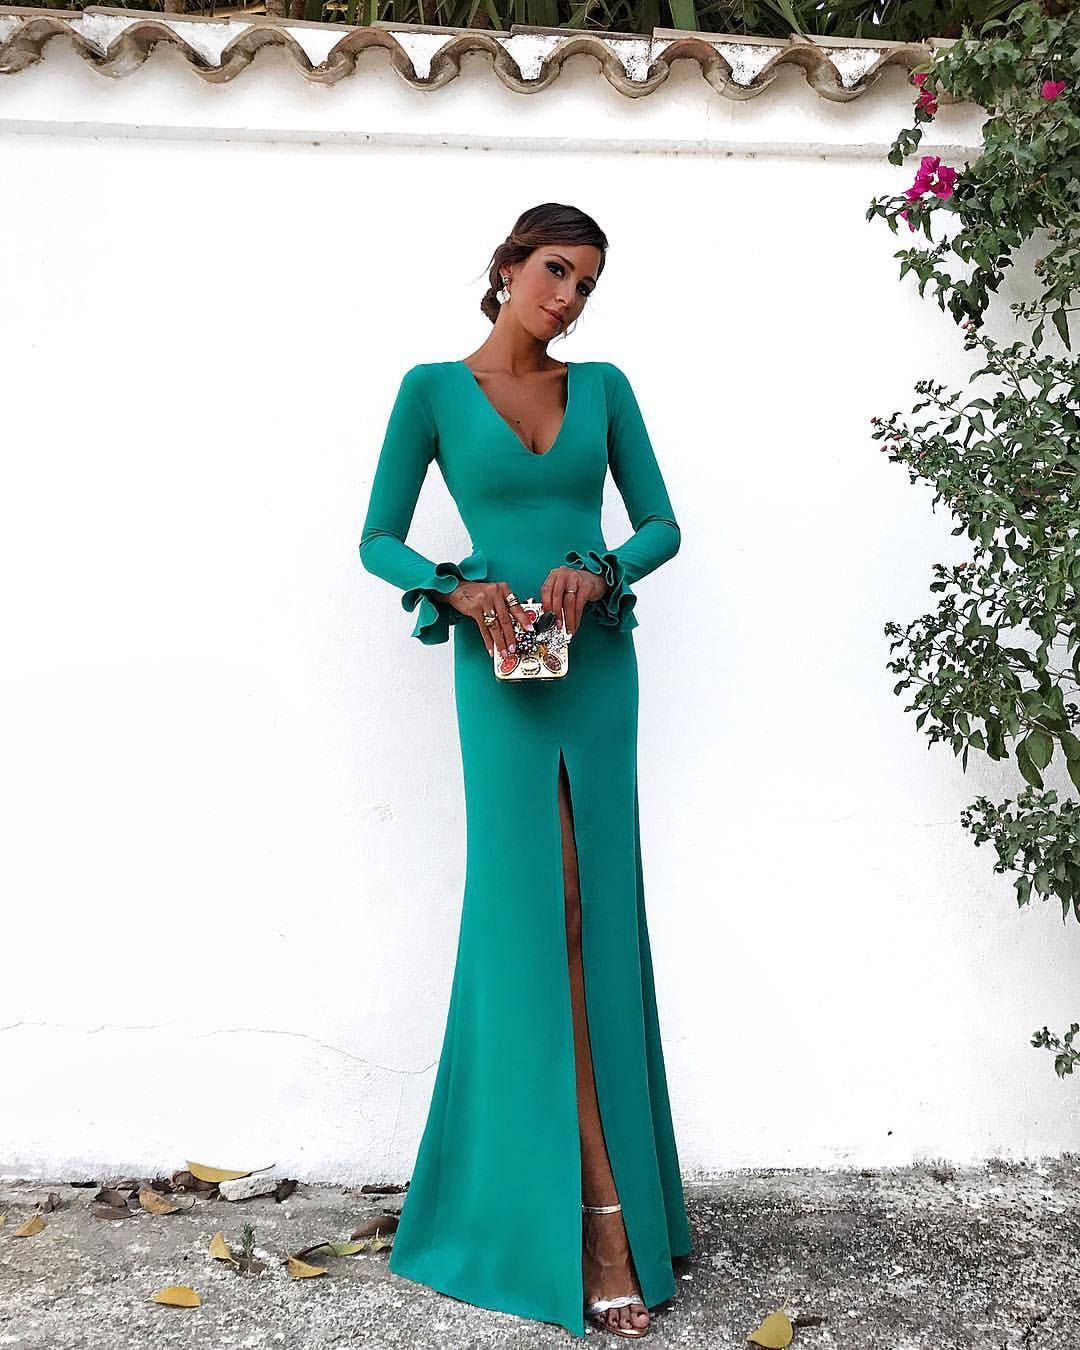 Pin de Elena Díaz-Valero en vestidos fiesta | Pinterest | Rocio ...